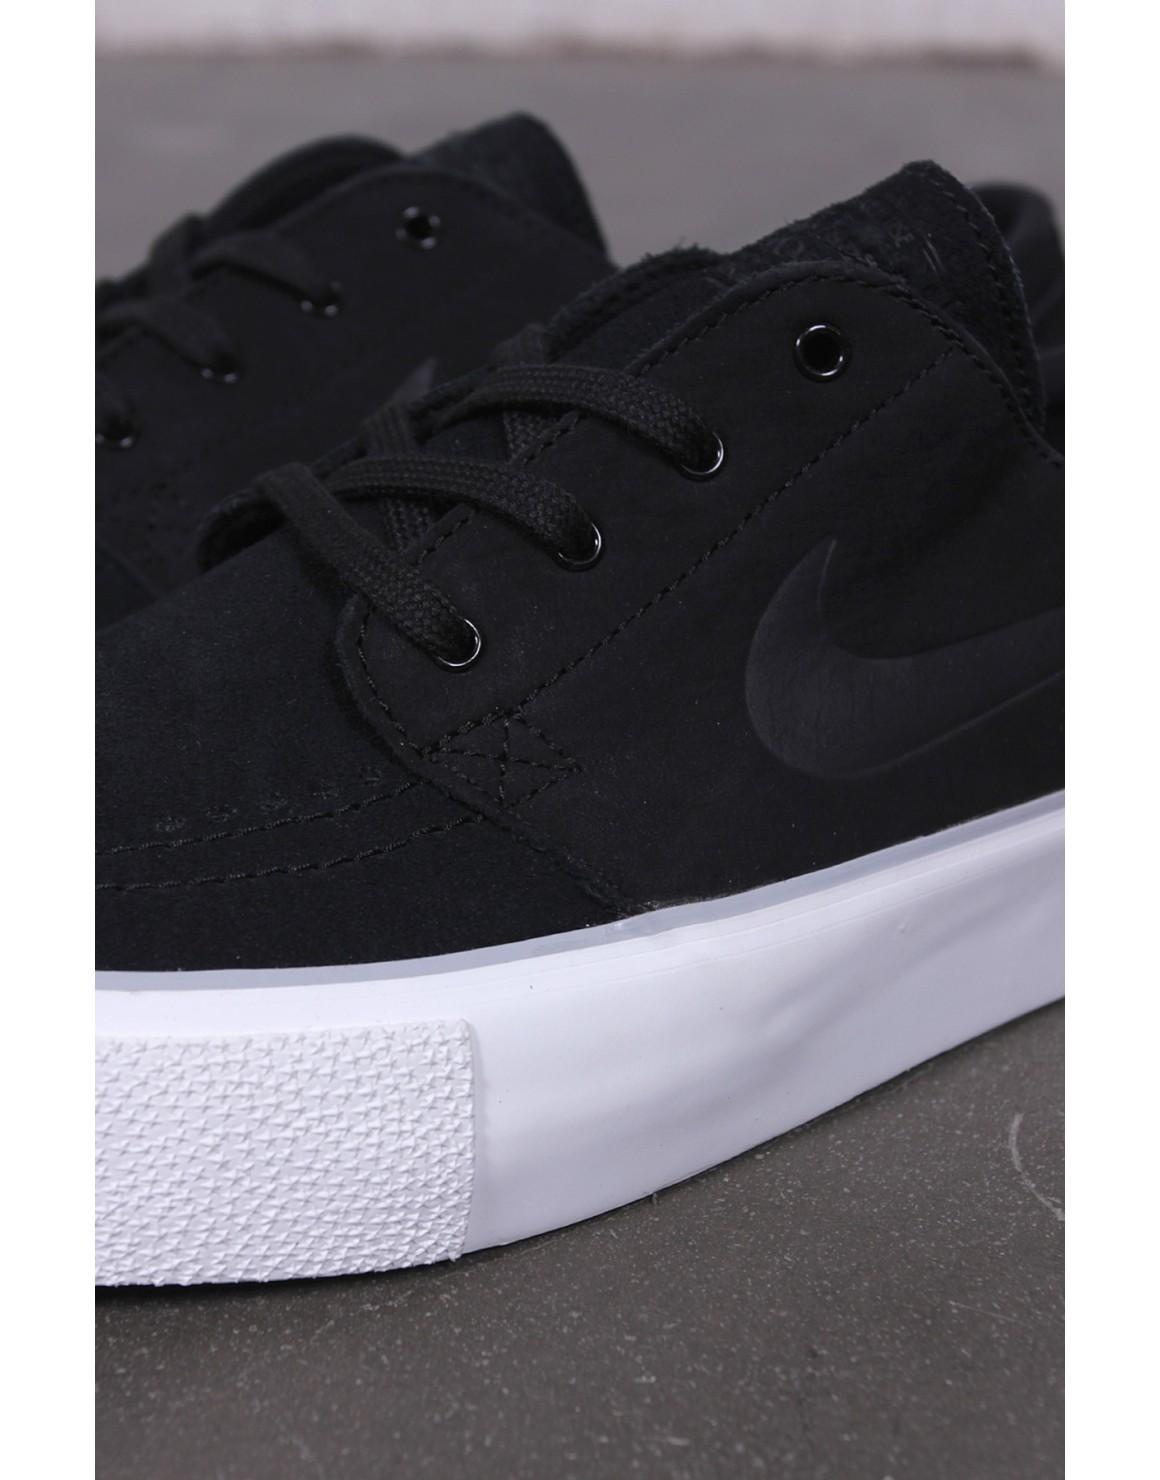 Women's Nike SB Stefan Janoski Max Skater shoes wolf grey